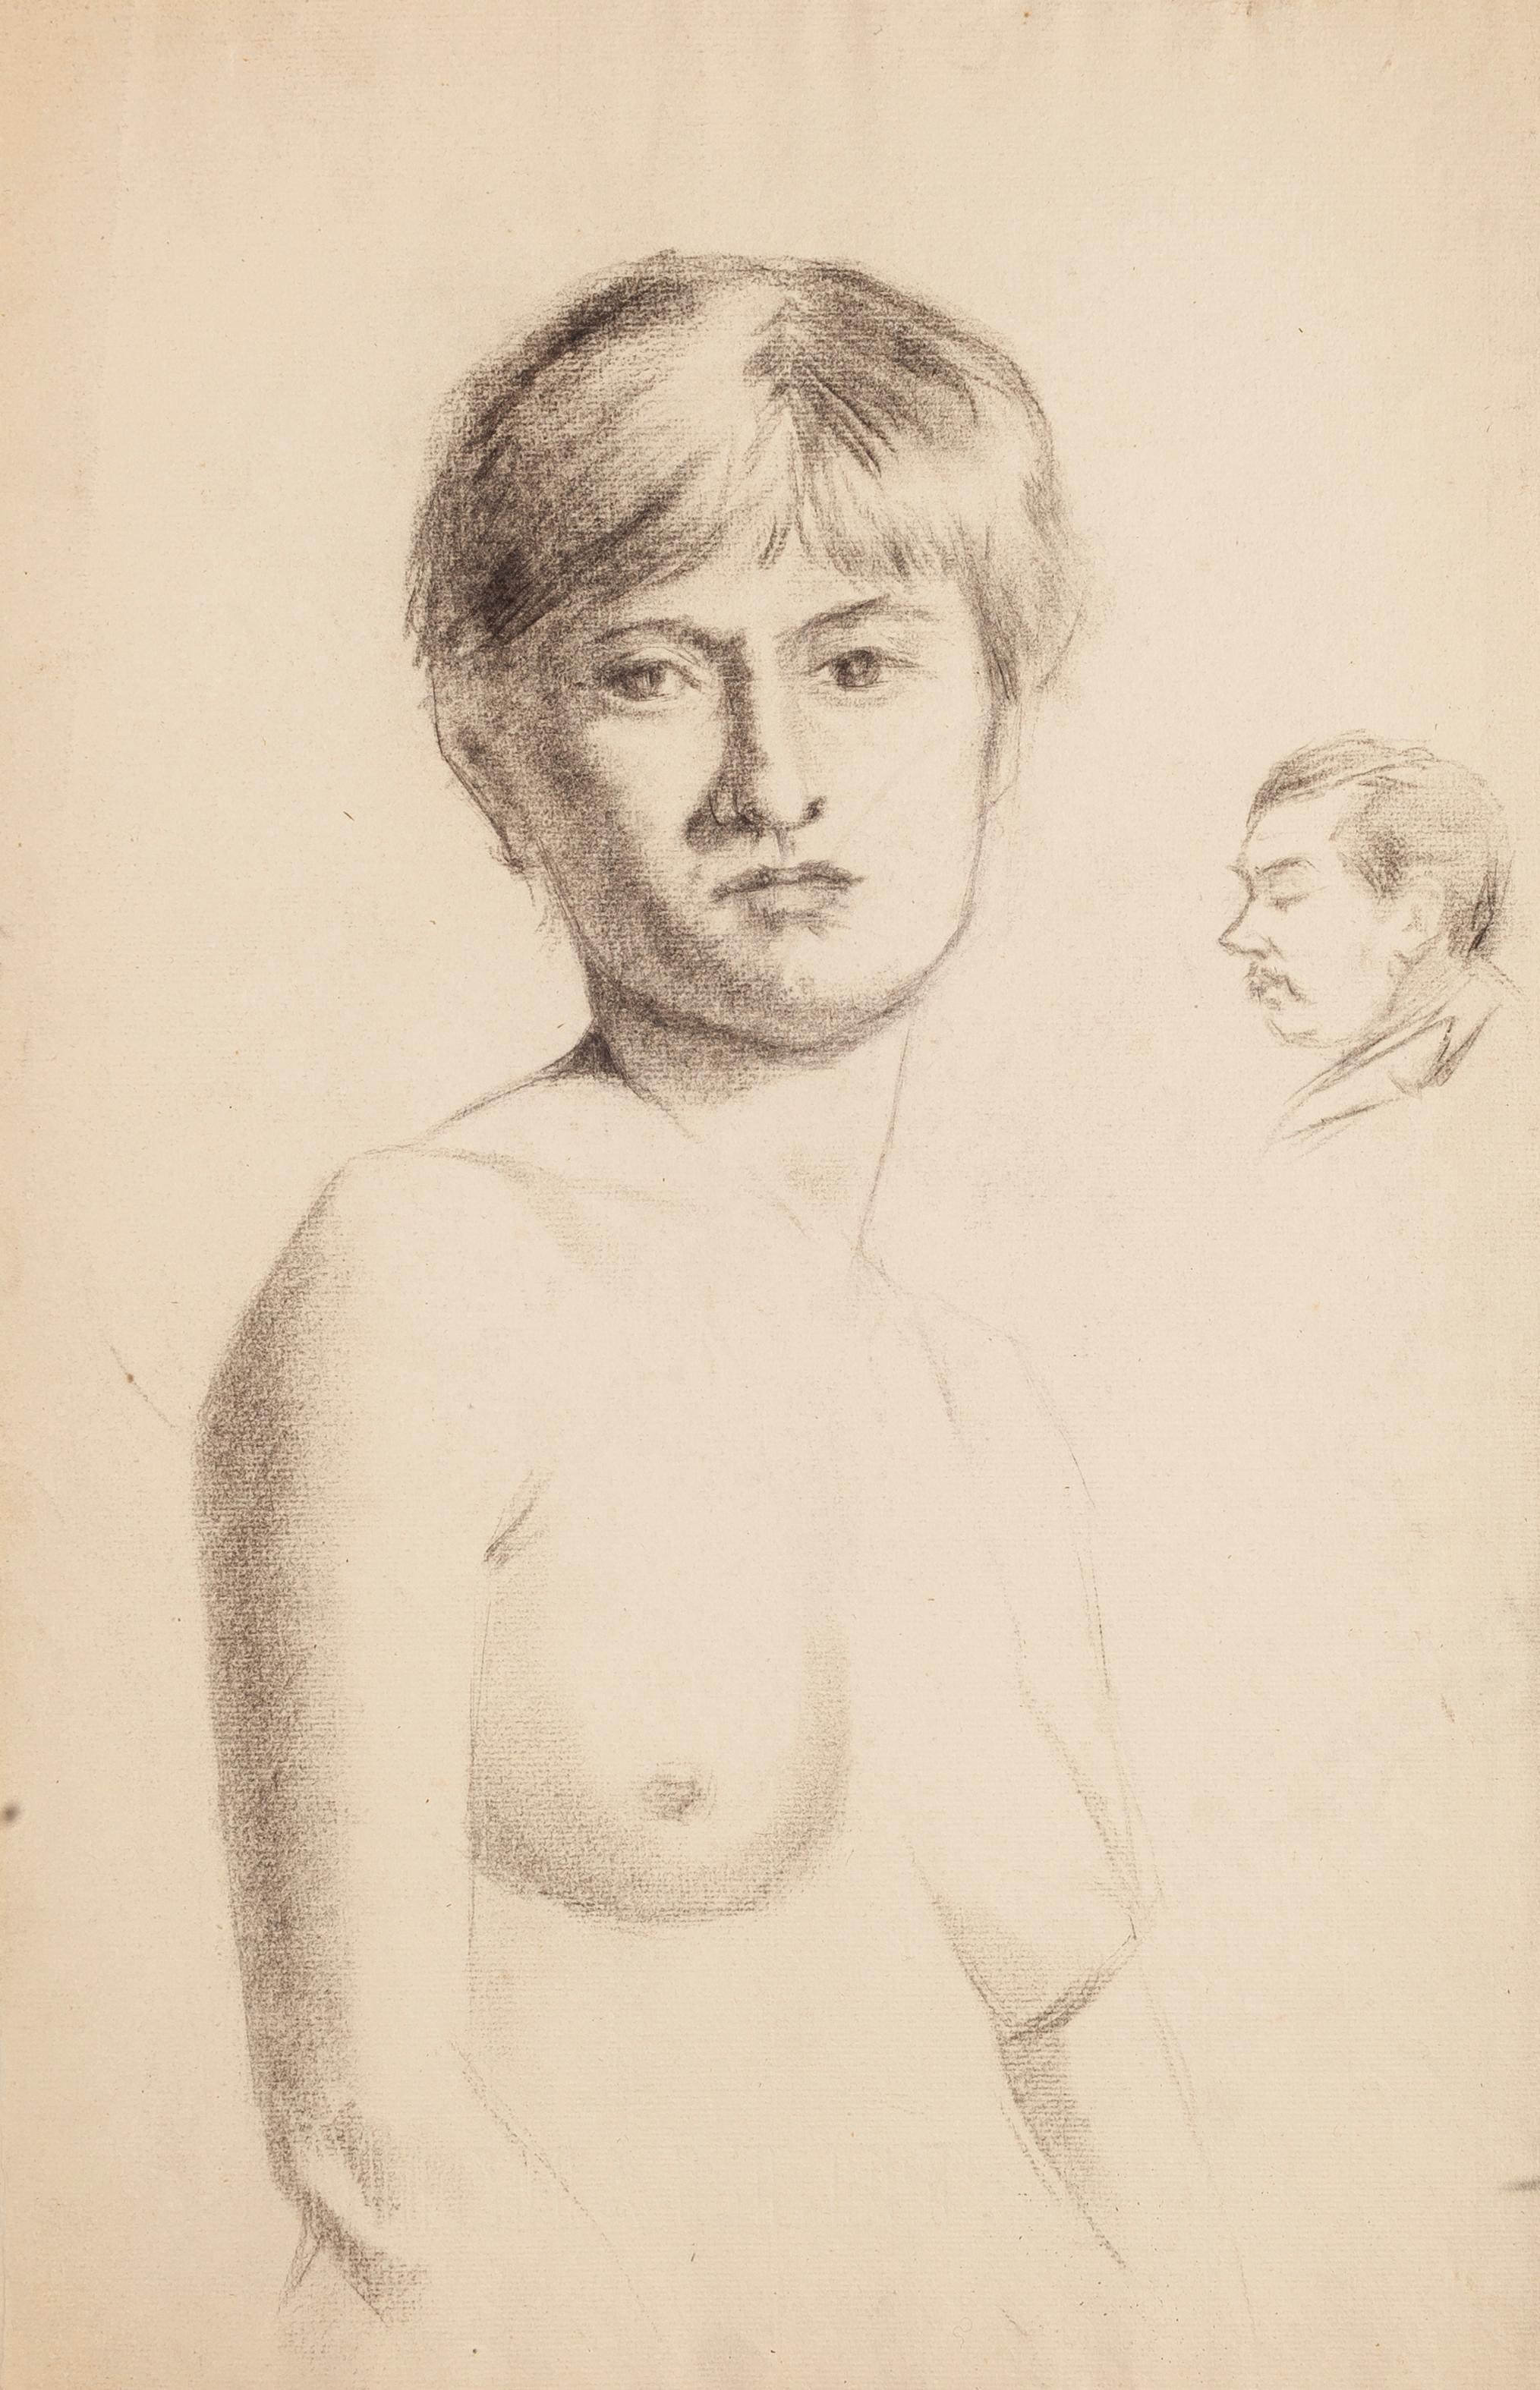 Portrait of a Nude Woman - Early 1900 - René François Xavier Prinet - Drawing